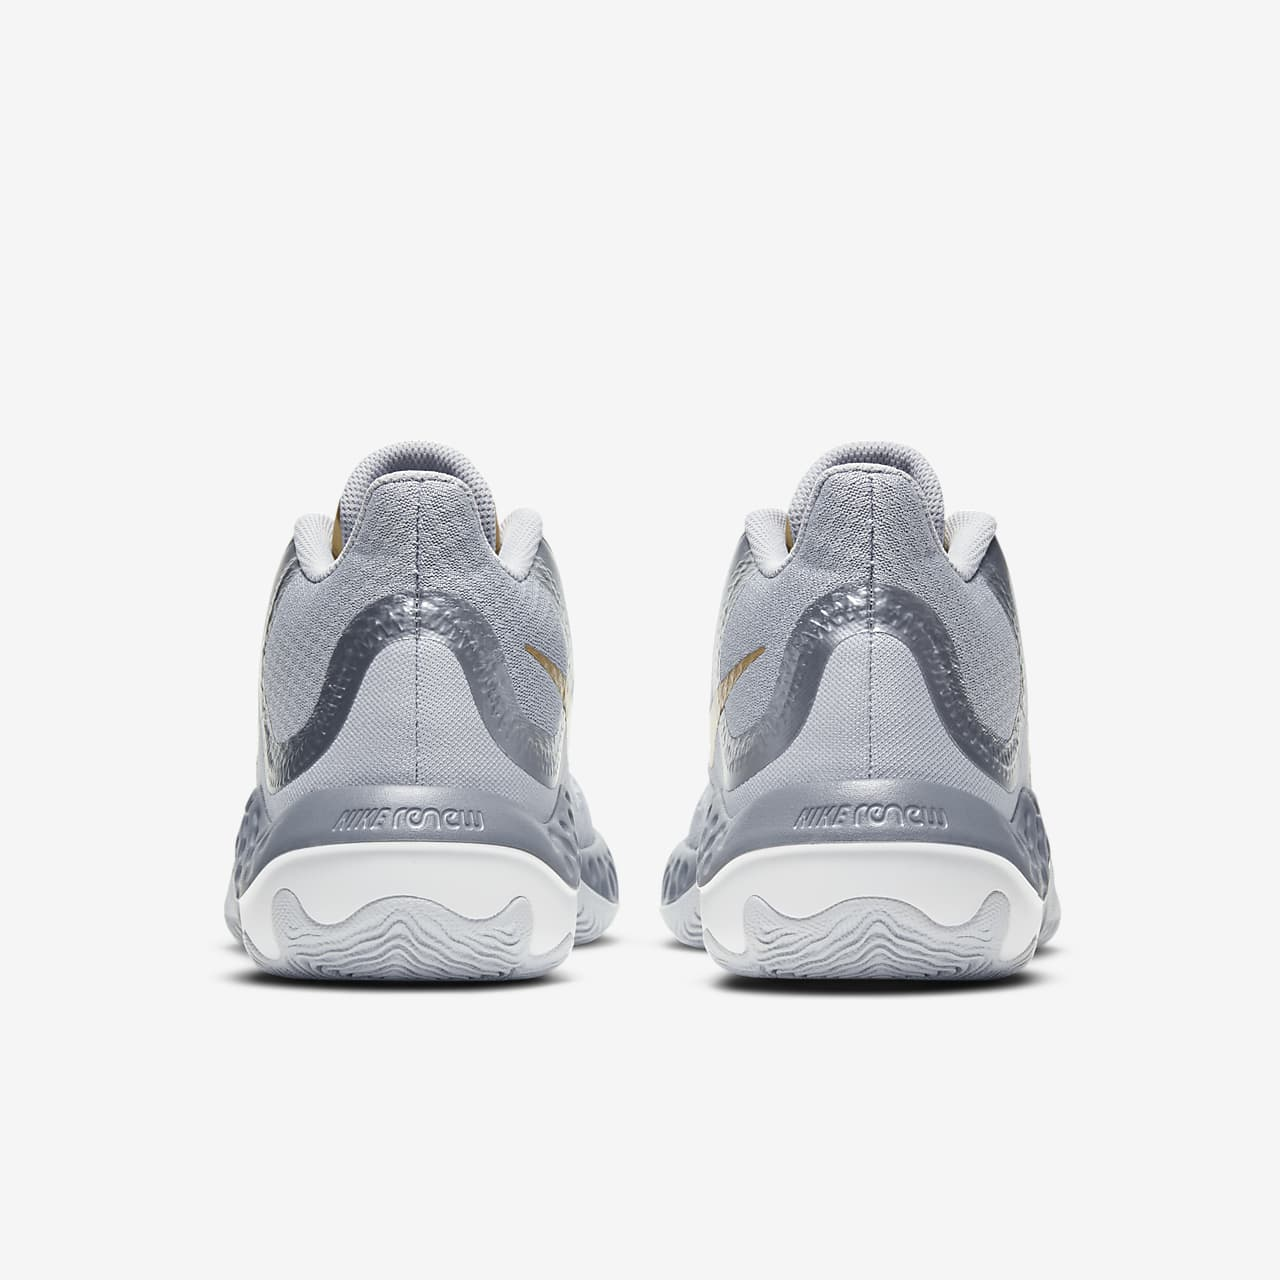 Nike Renew Elevate Basketball Shoe CK2669-007